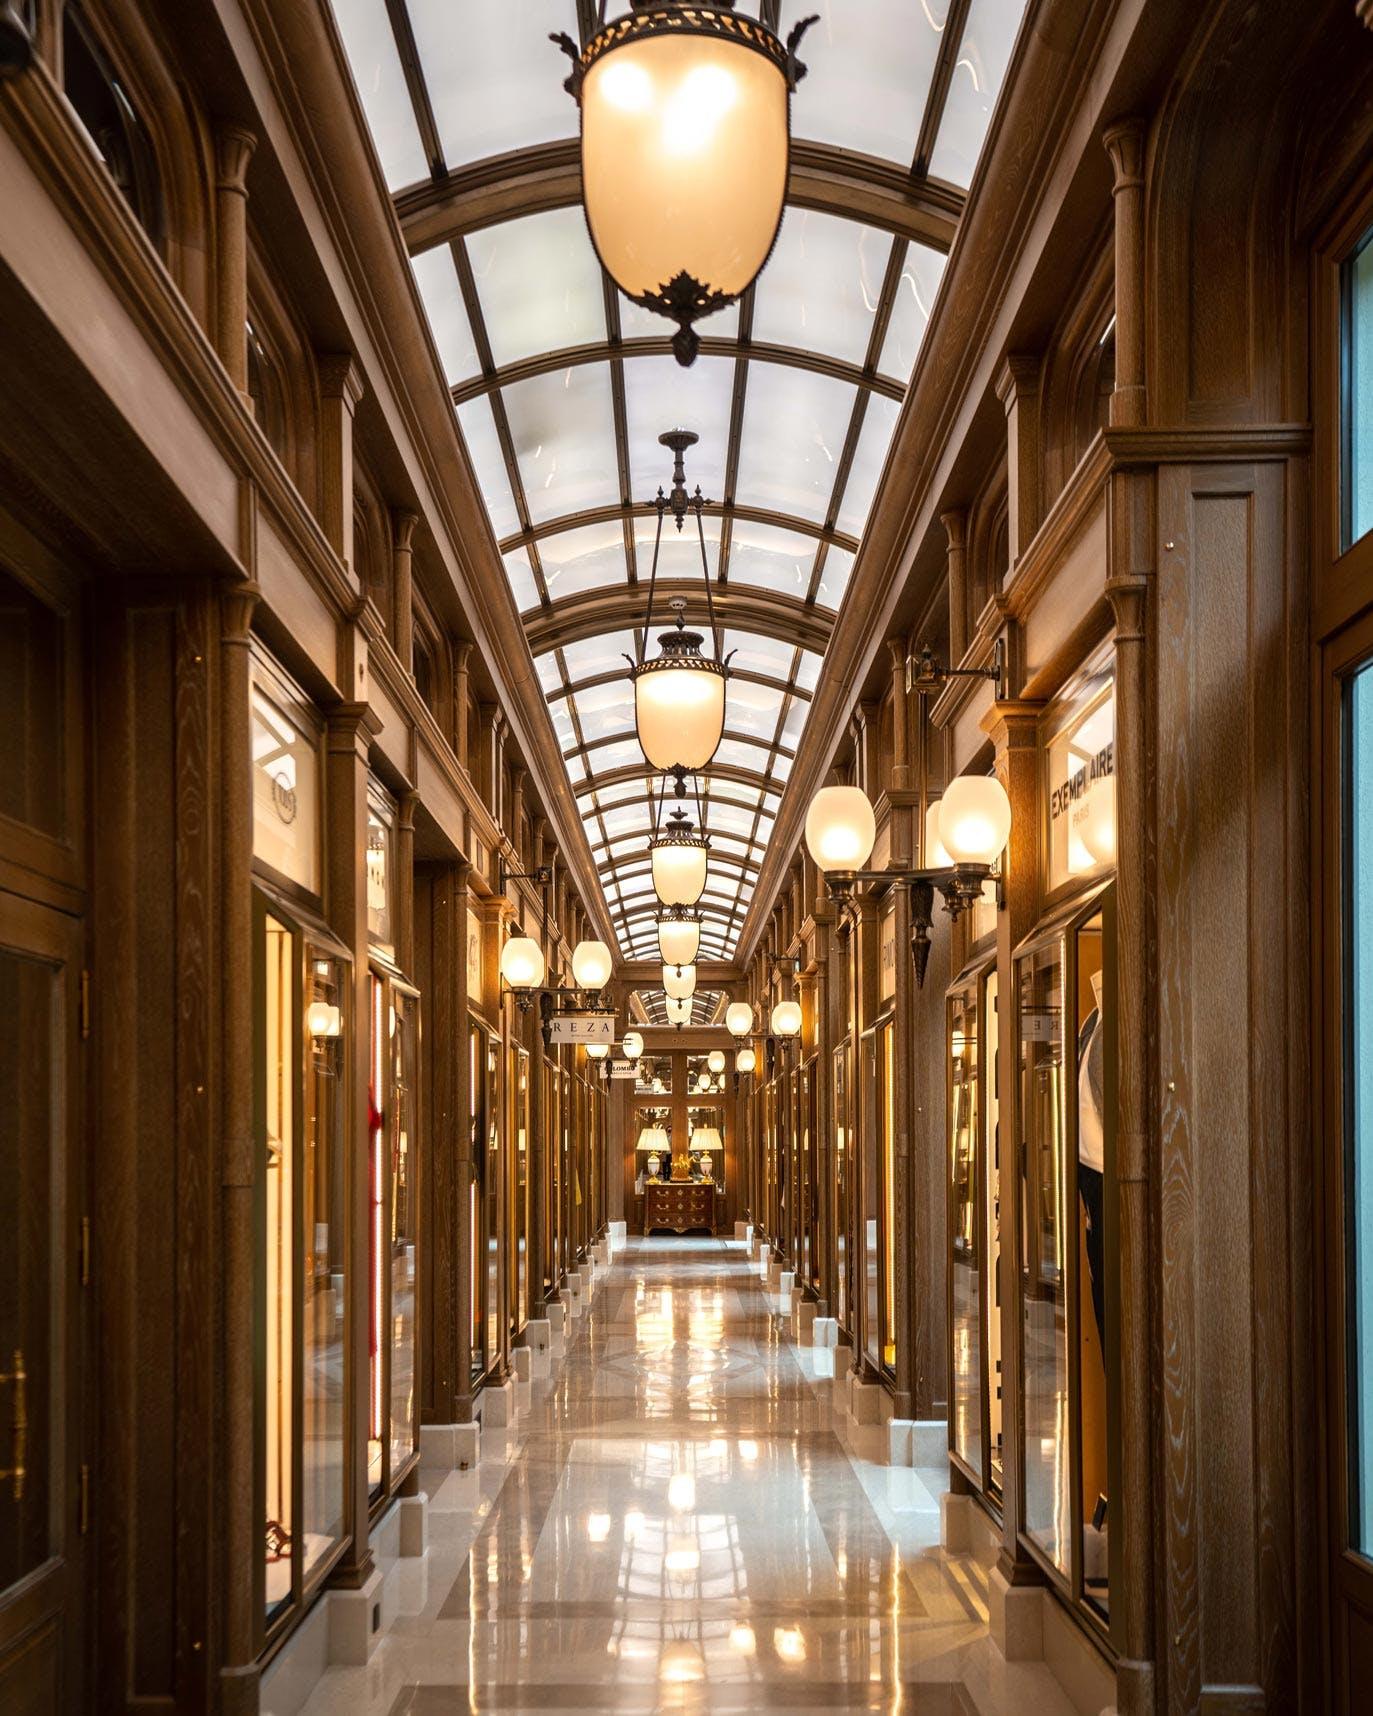 Hôtel Ritz Shopping Gallery